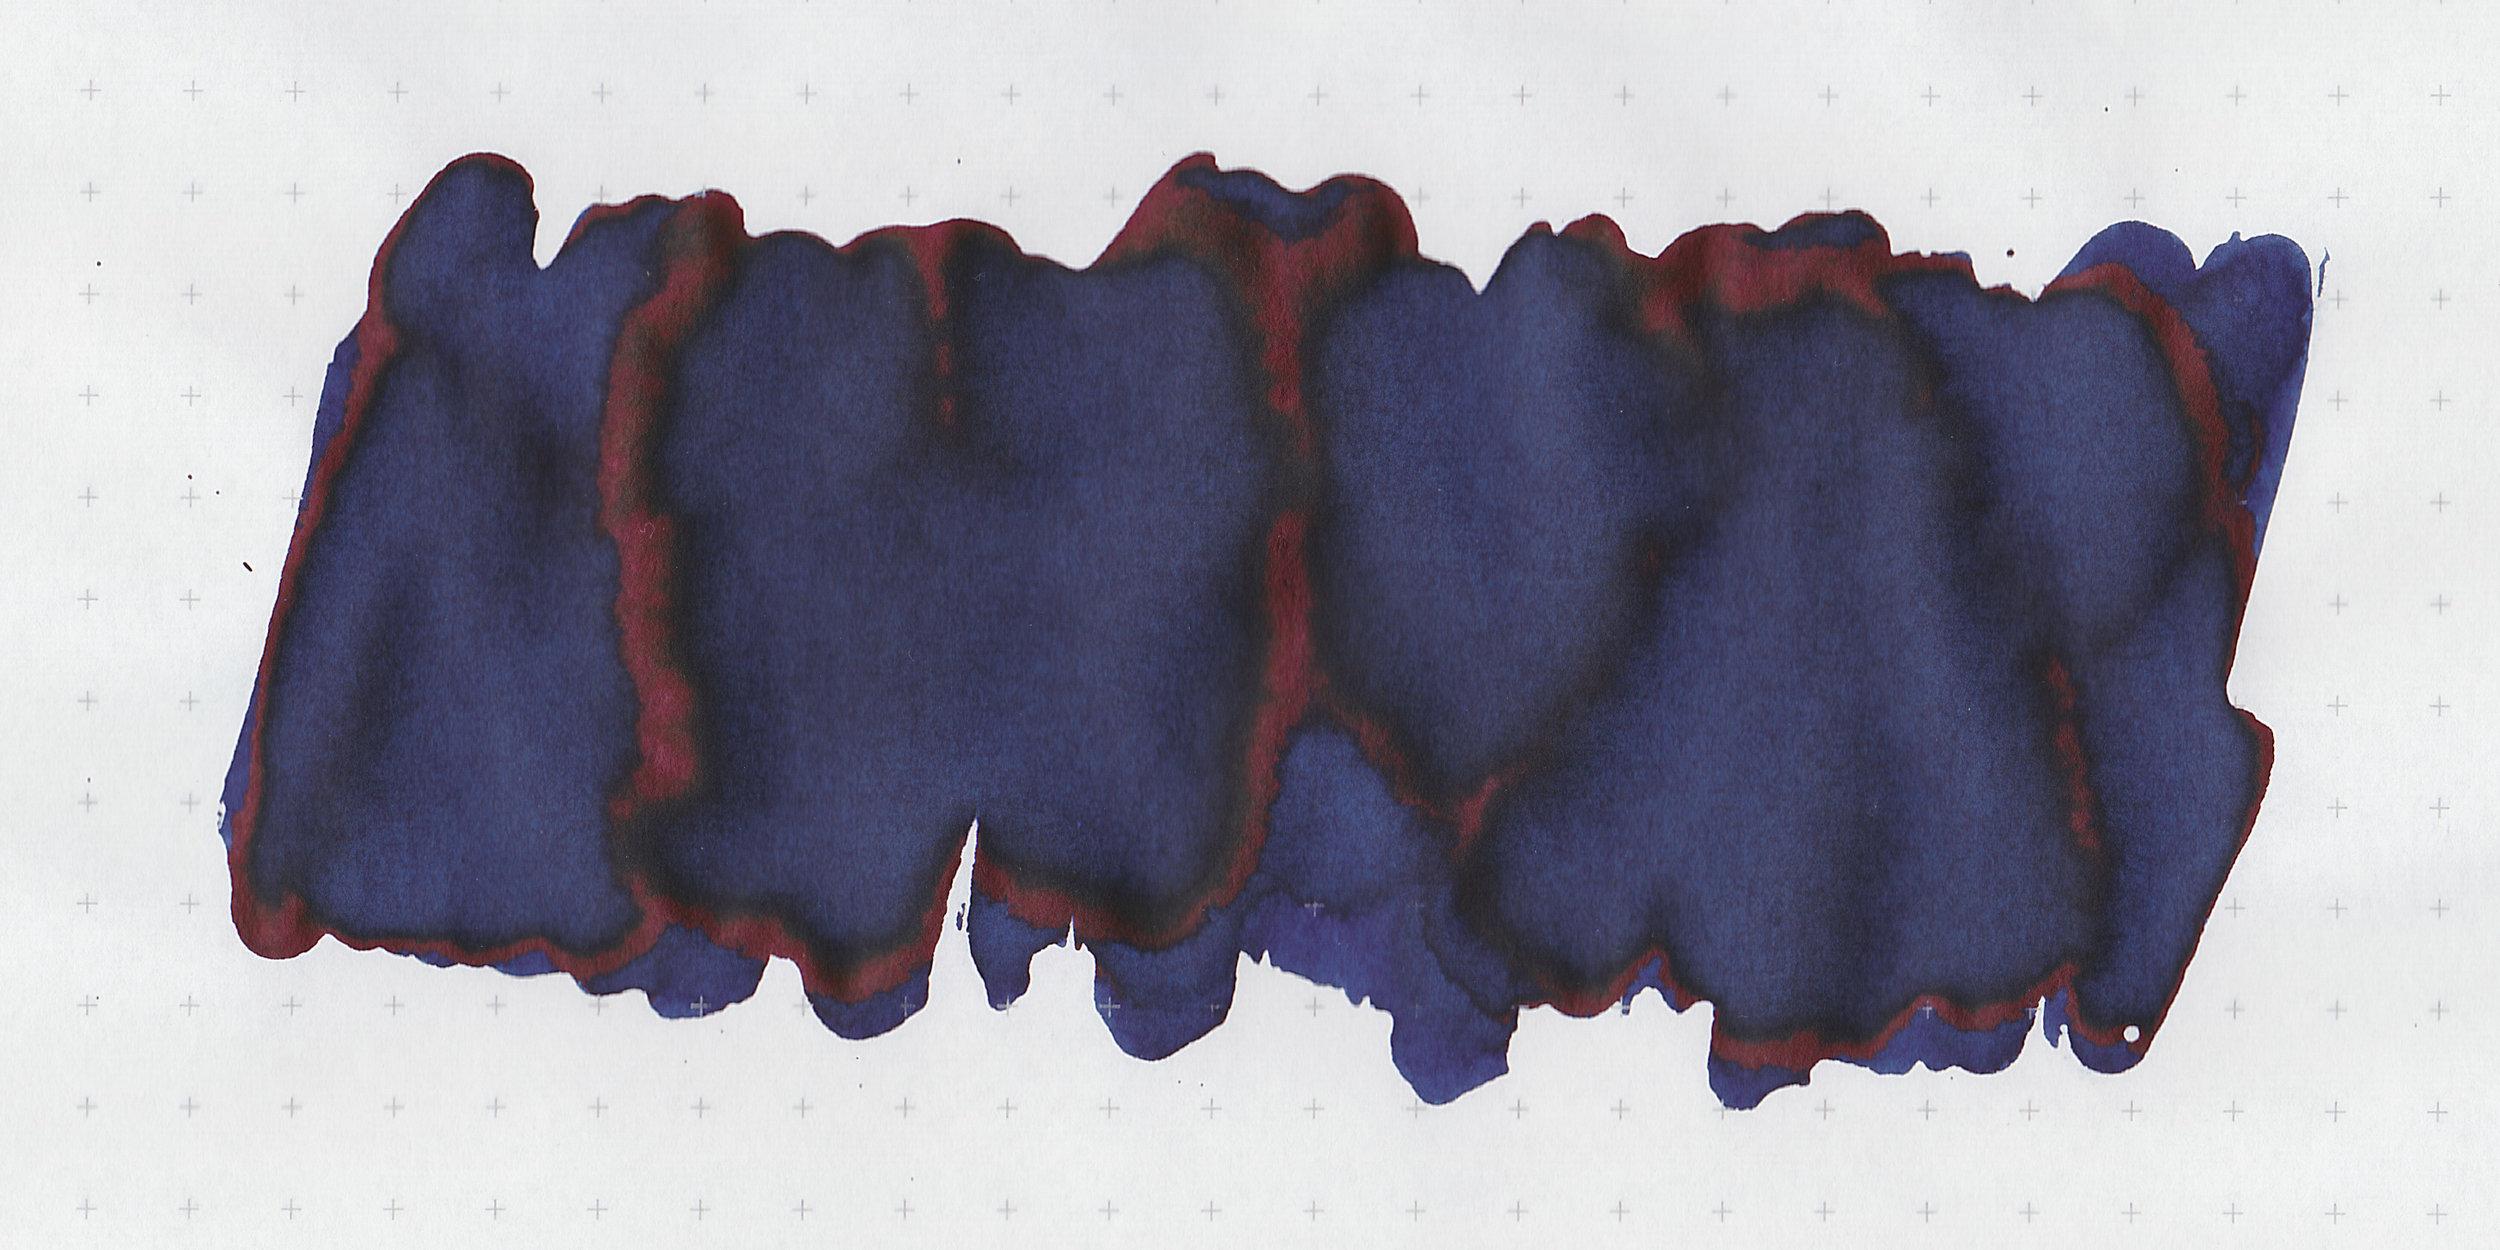 d-1864-blue-black-6.jpg